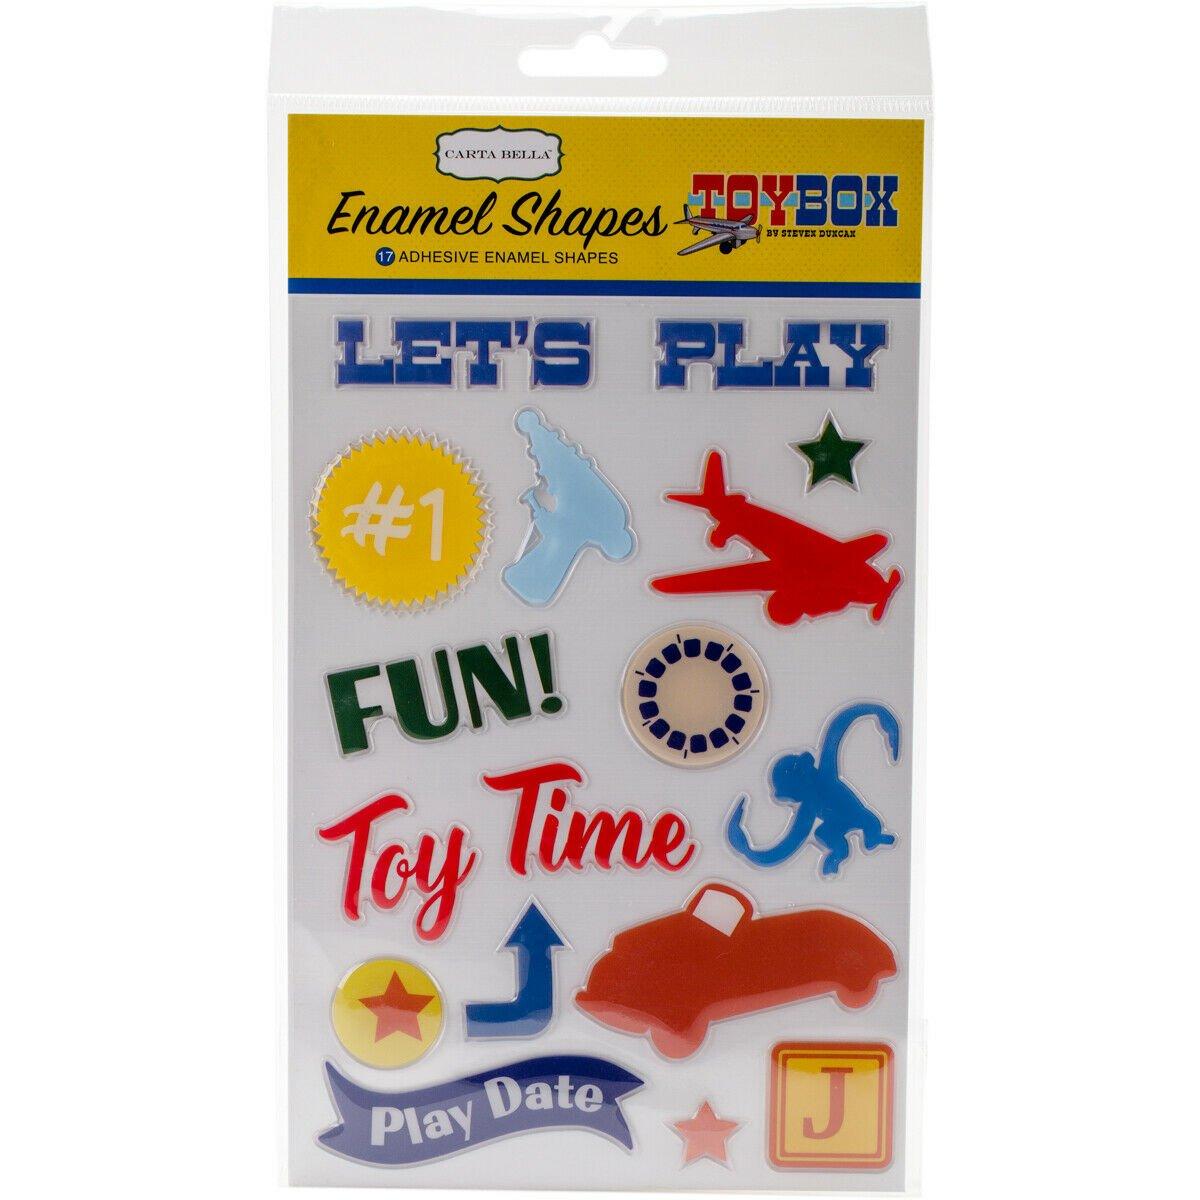 Carta Bella Toy Box Enamel Shapes